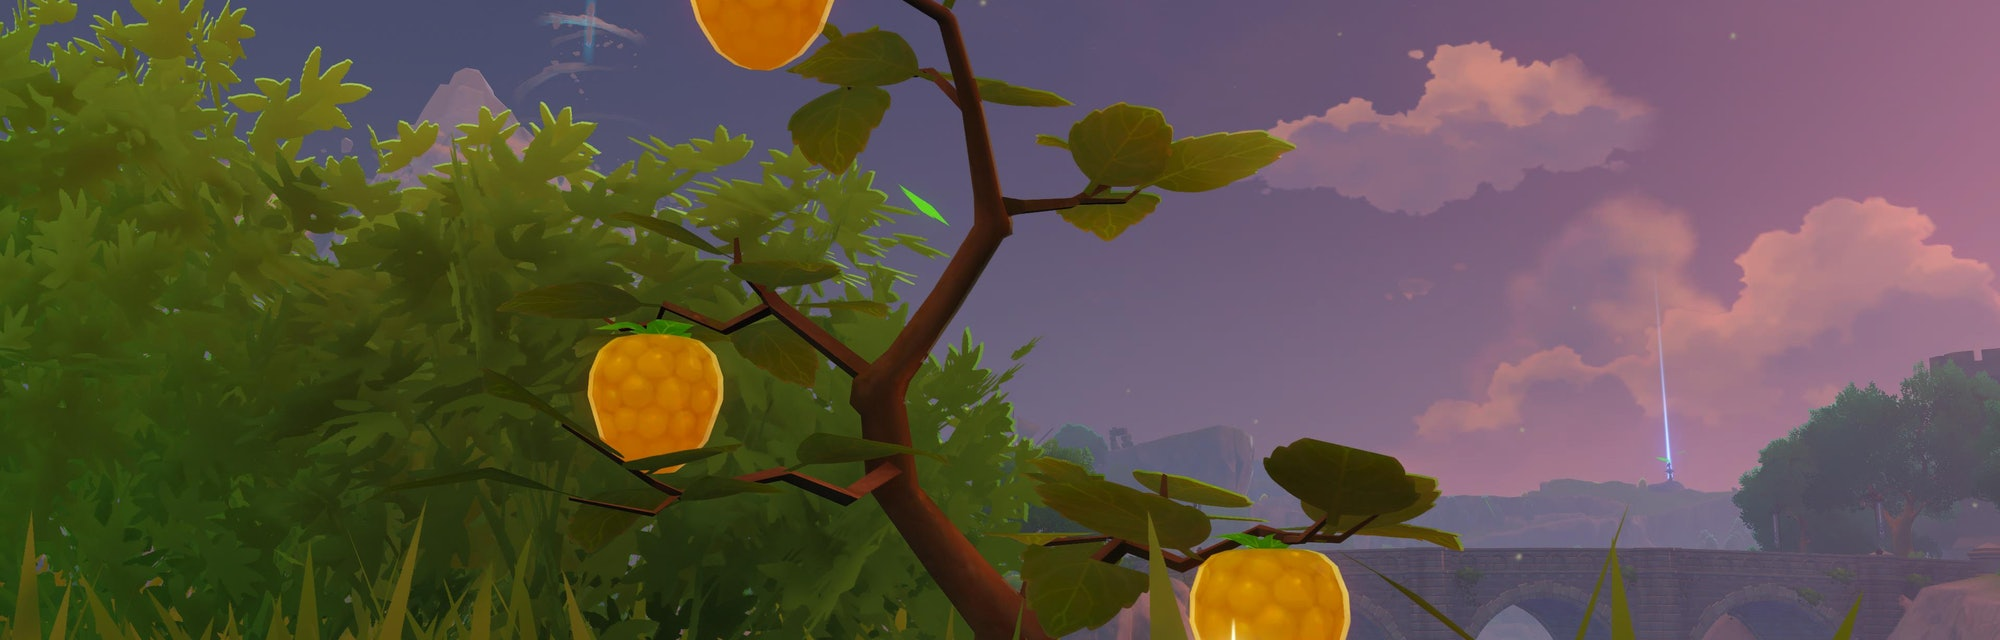 Berries Genshin Impact